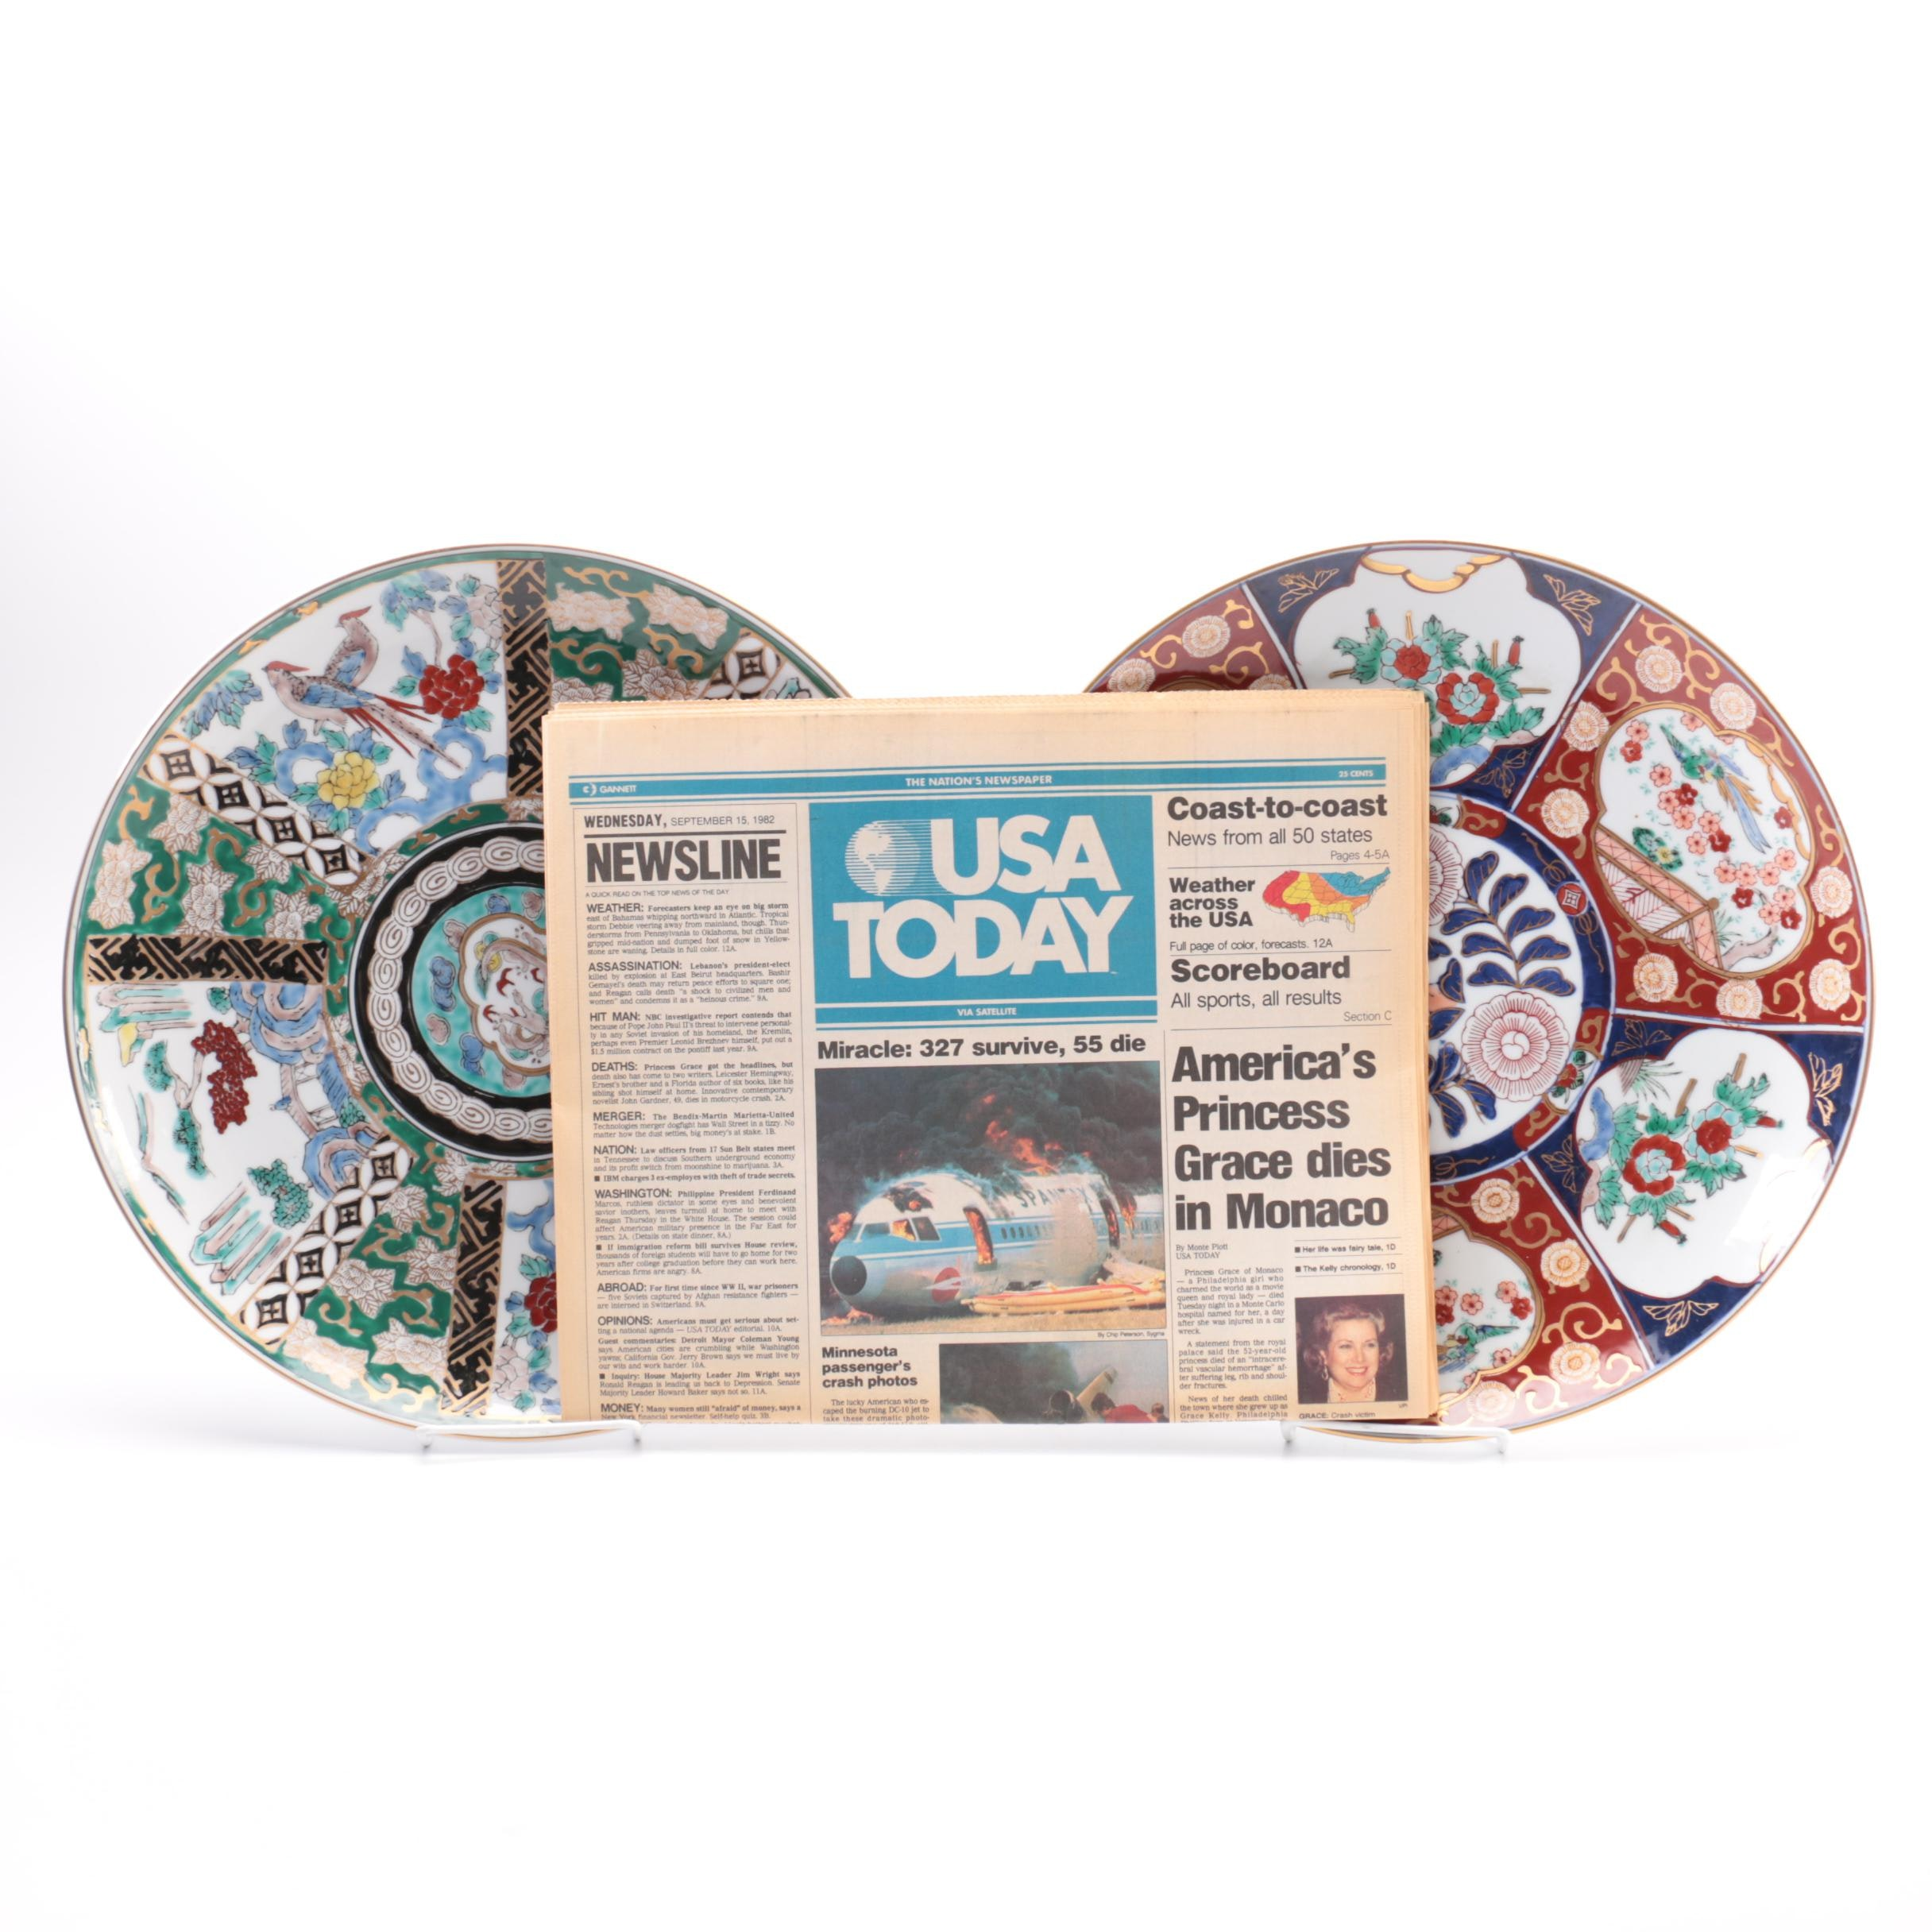 Gold Imari Hand-Painted Rose Medallion Style Porcelain Plates